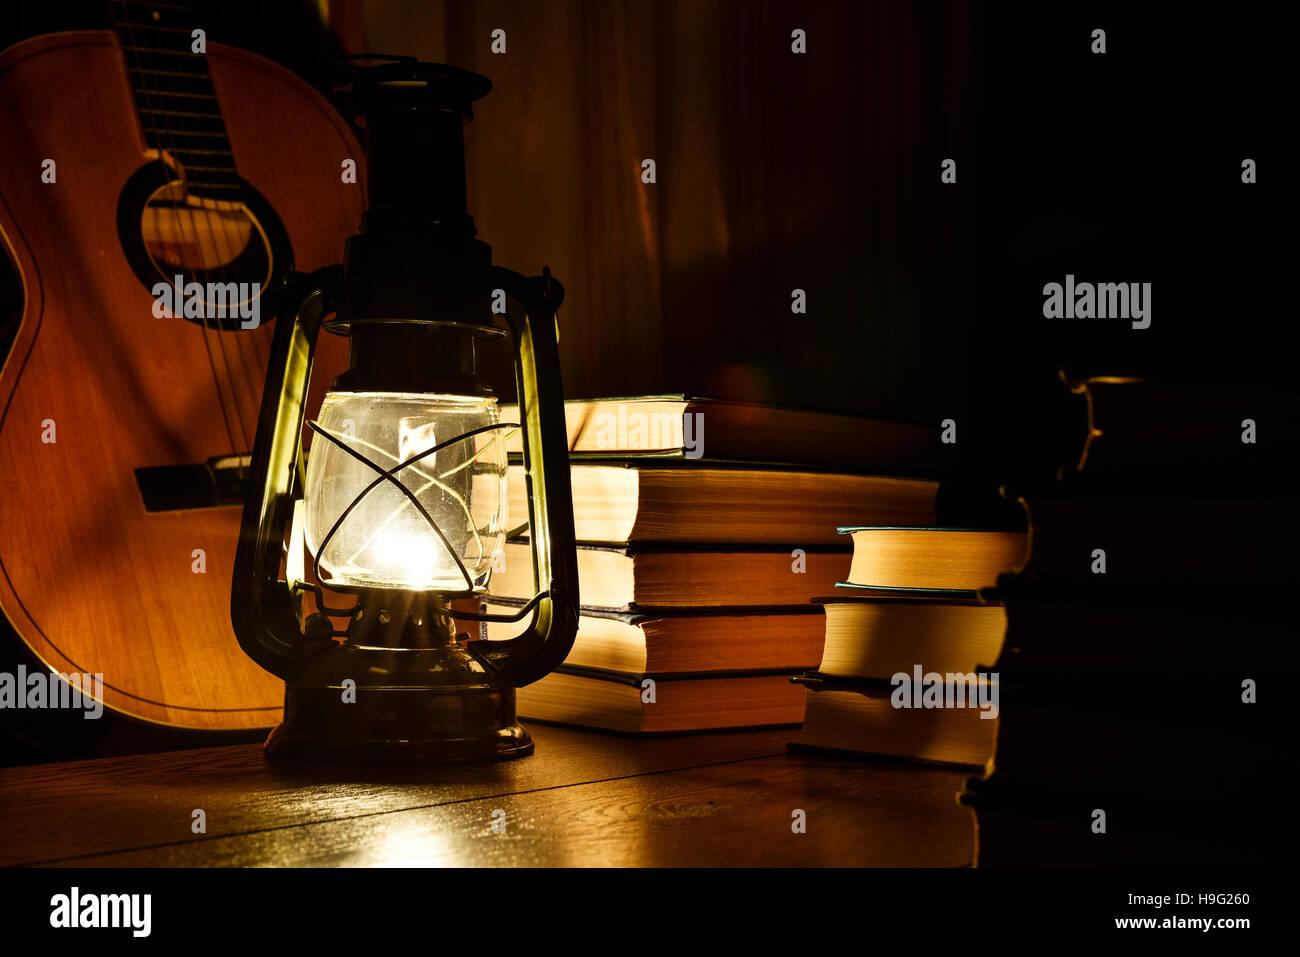 Kerosene lamp, guitar and books on the table - Stock Image